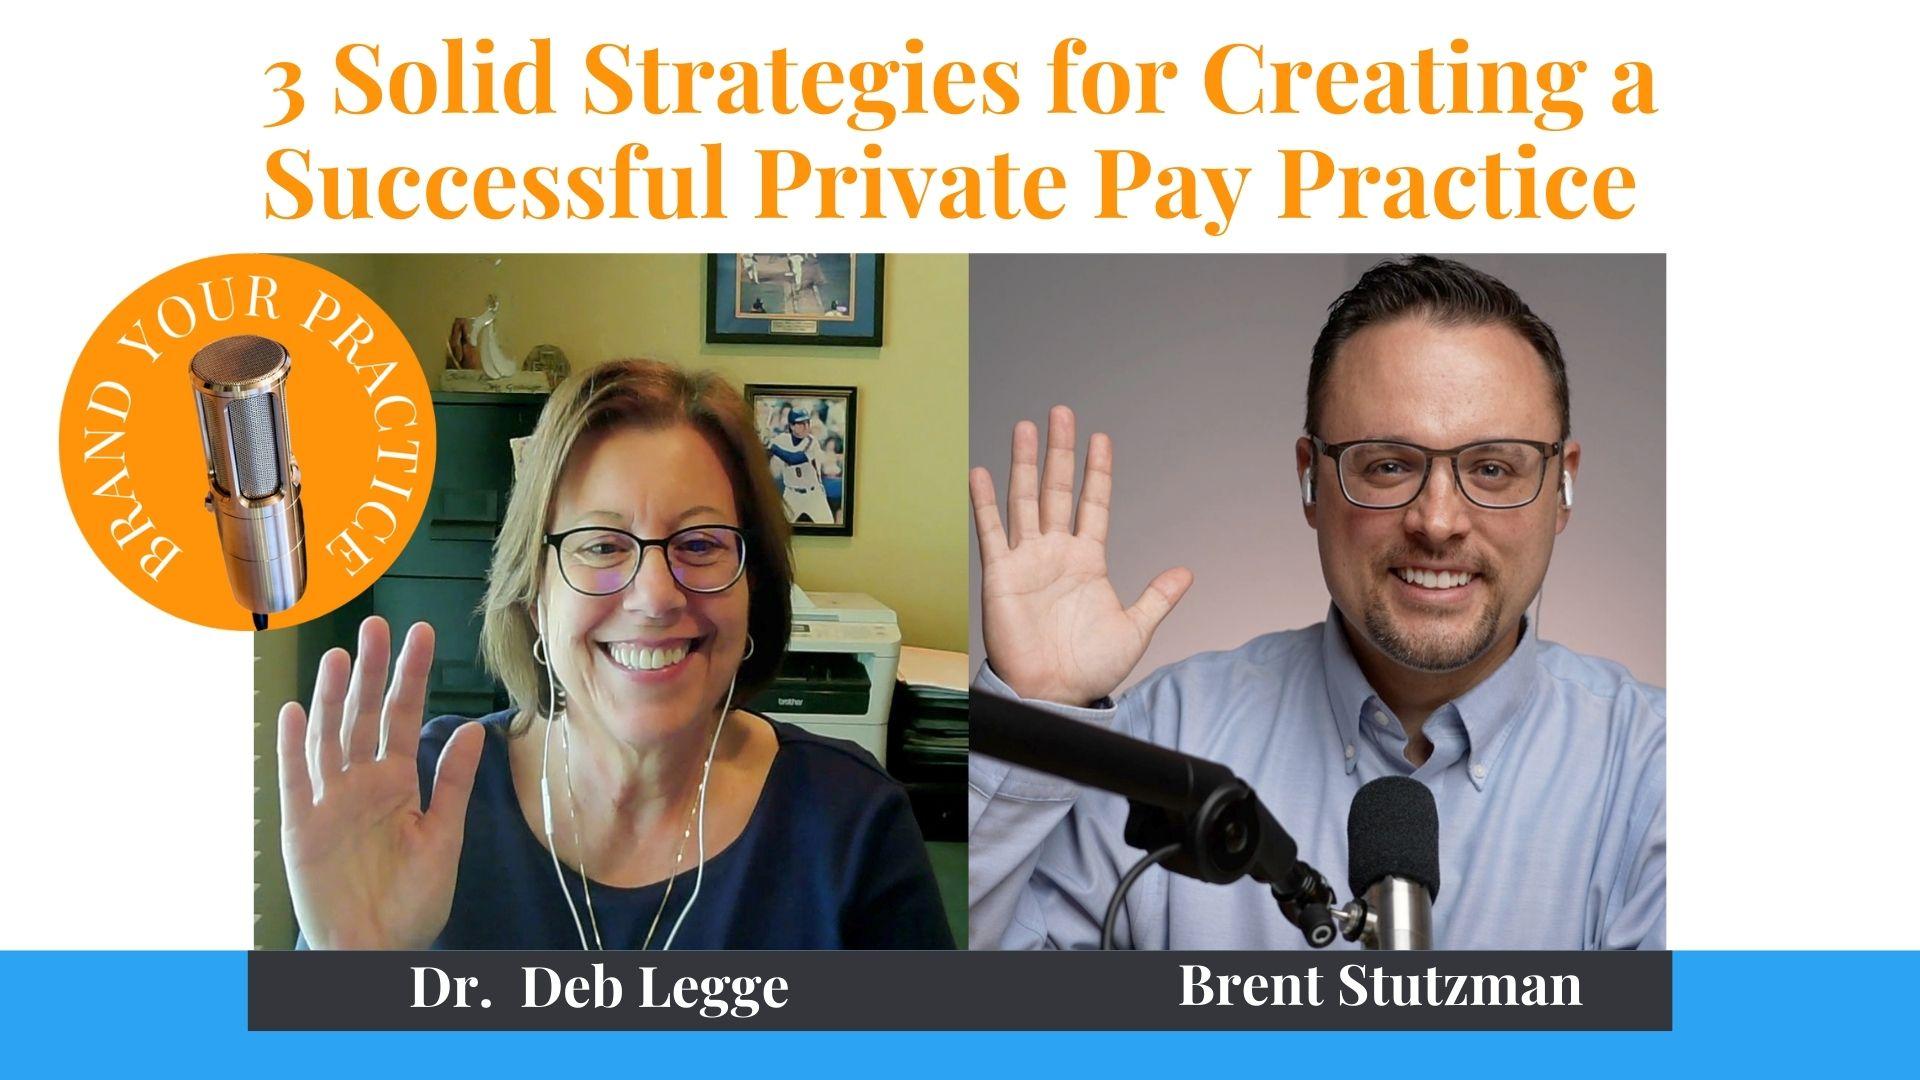 Successful Private Pay Practice - Dr. Deb Legge